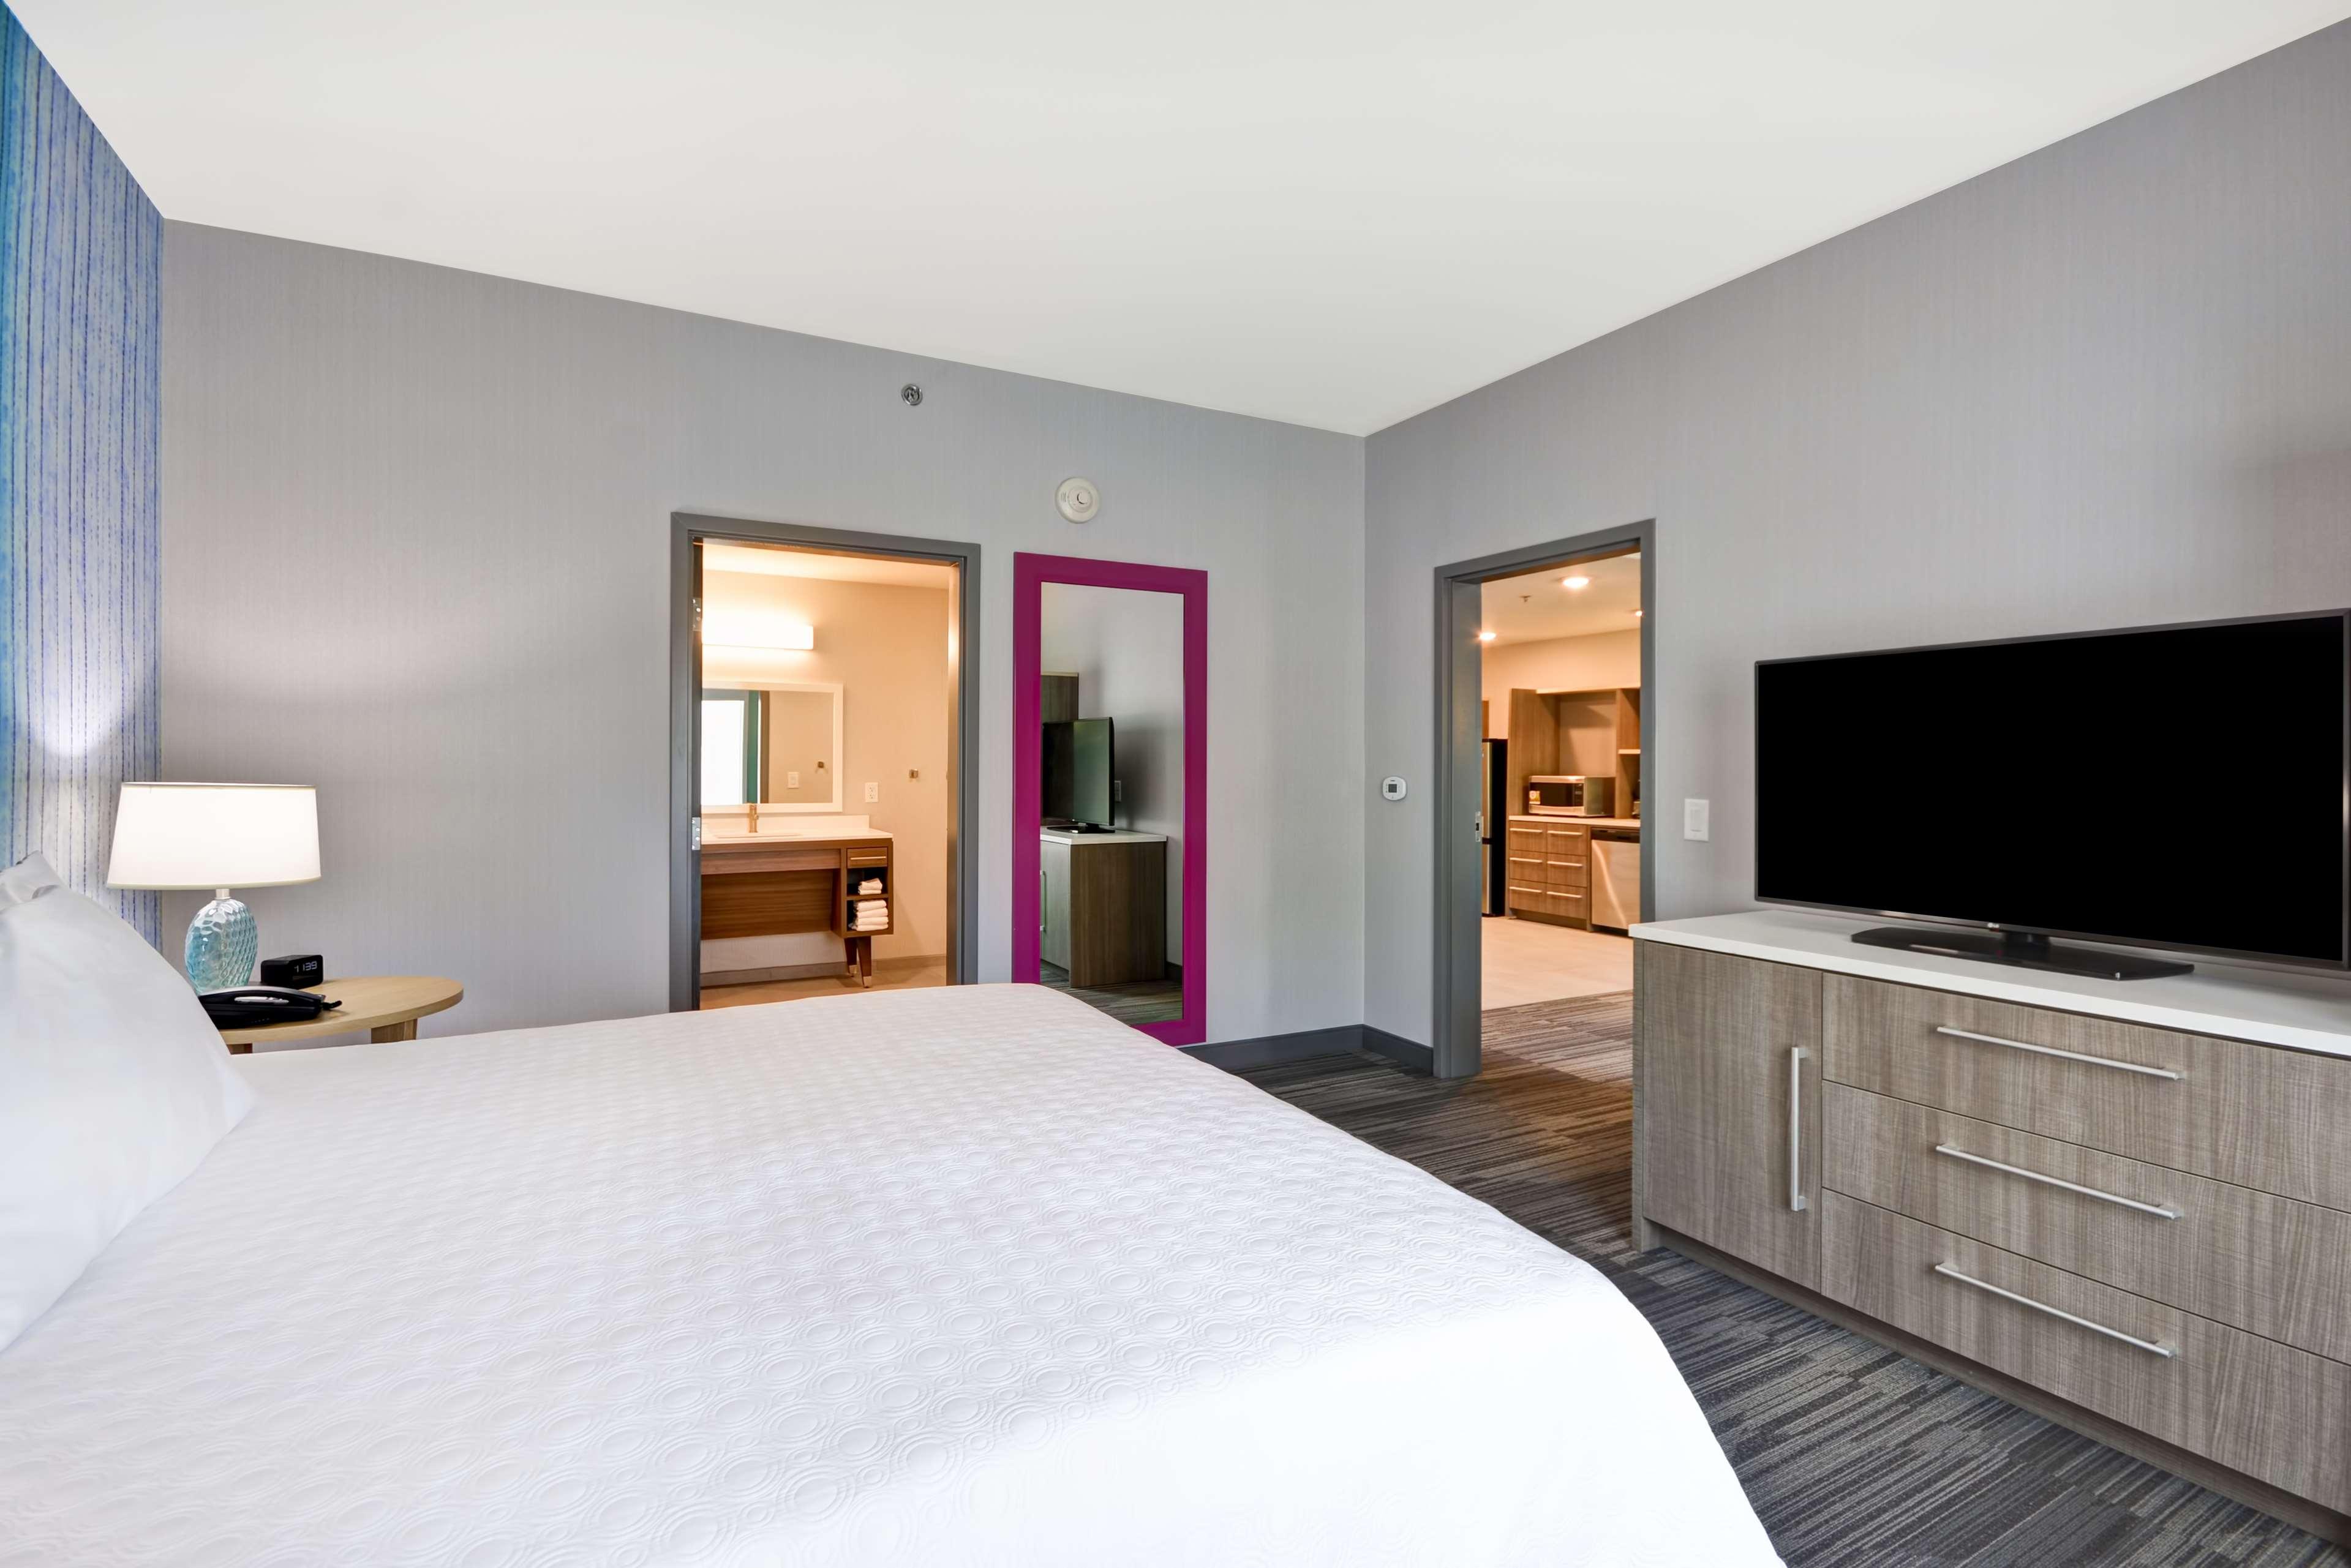 Home2 Suites by Hilton Atlanta West Lithia Springs image 24